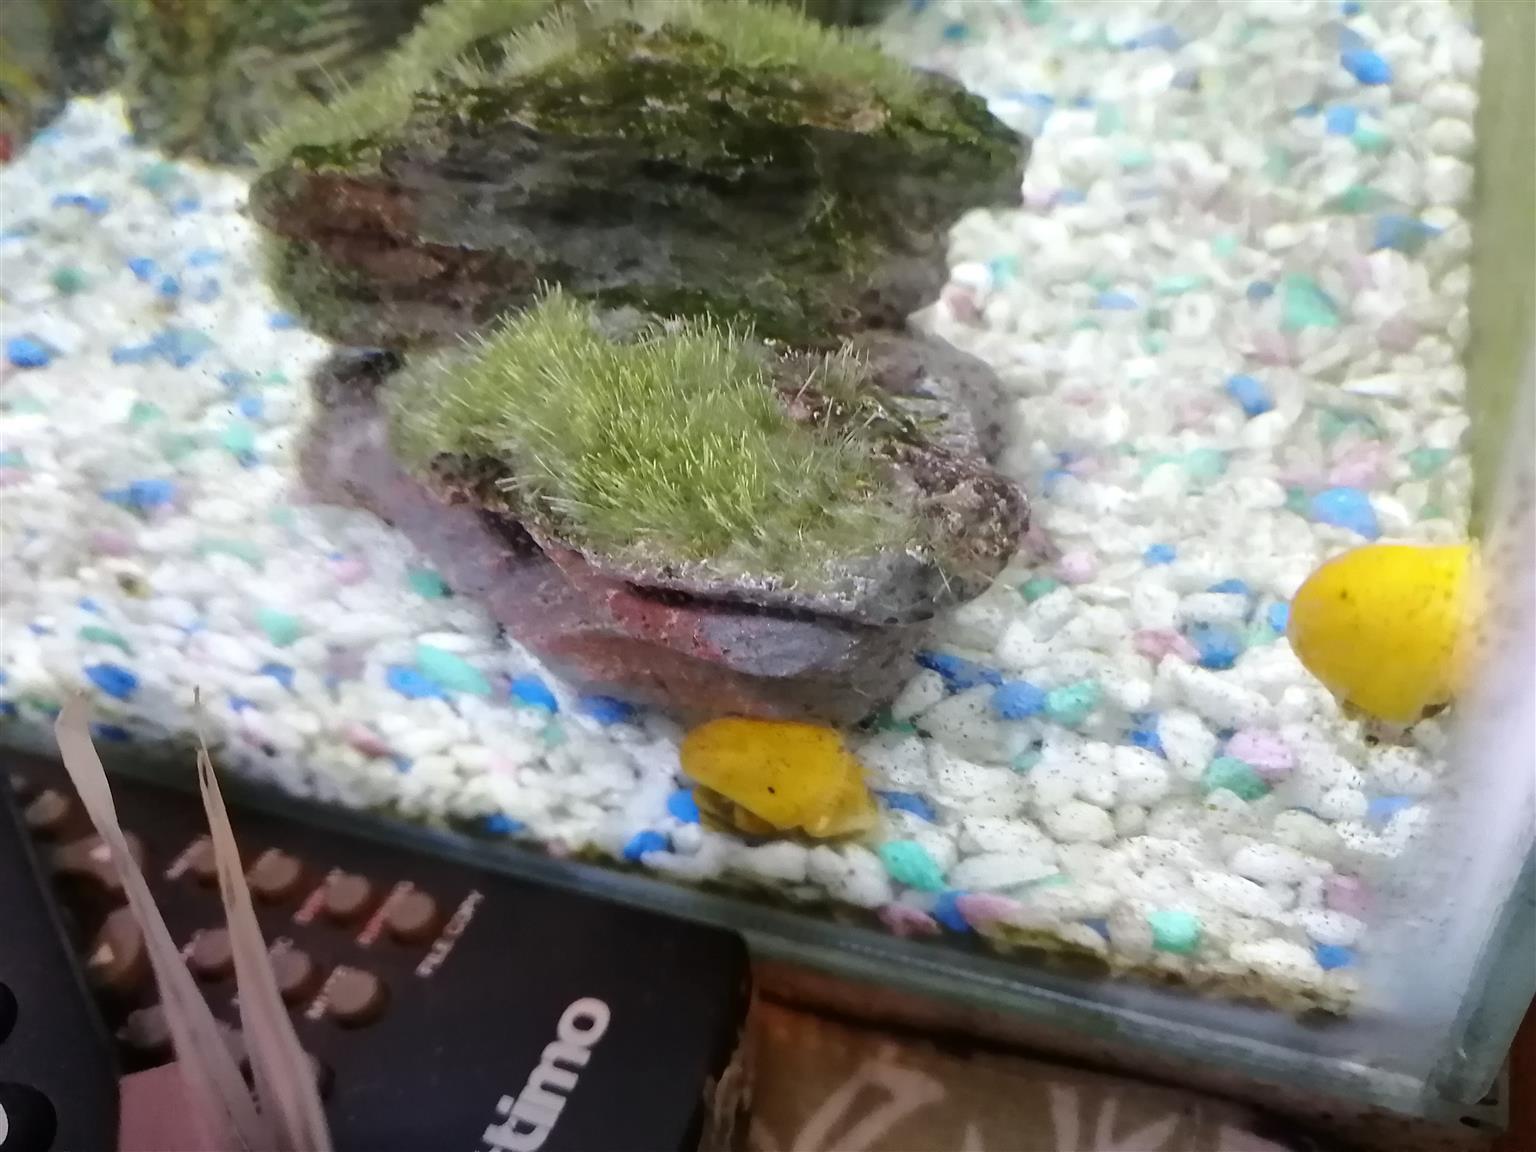 Apple snails for sale